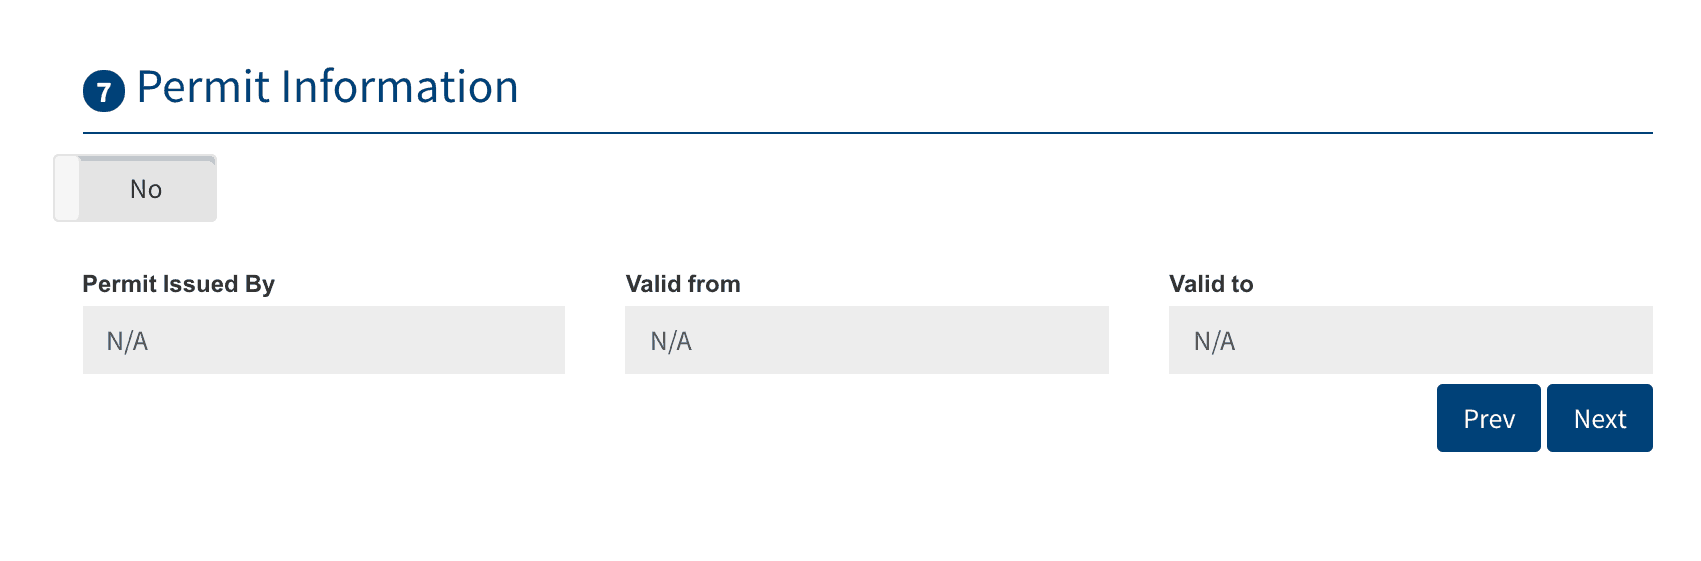 Italian Schengen Visa Requirements Application Process Via Center The Poor Traveler Itinerary Blog